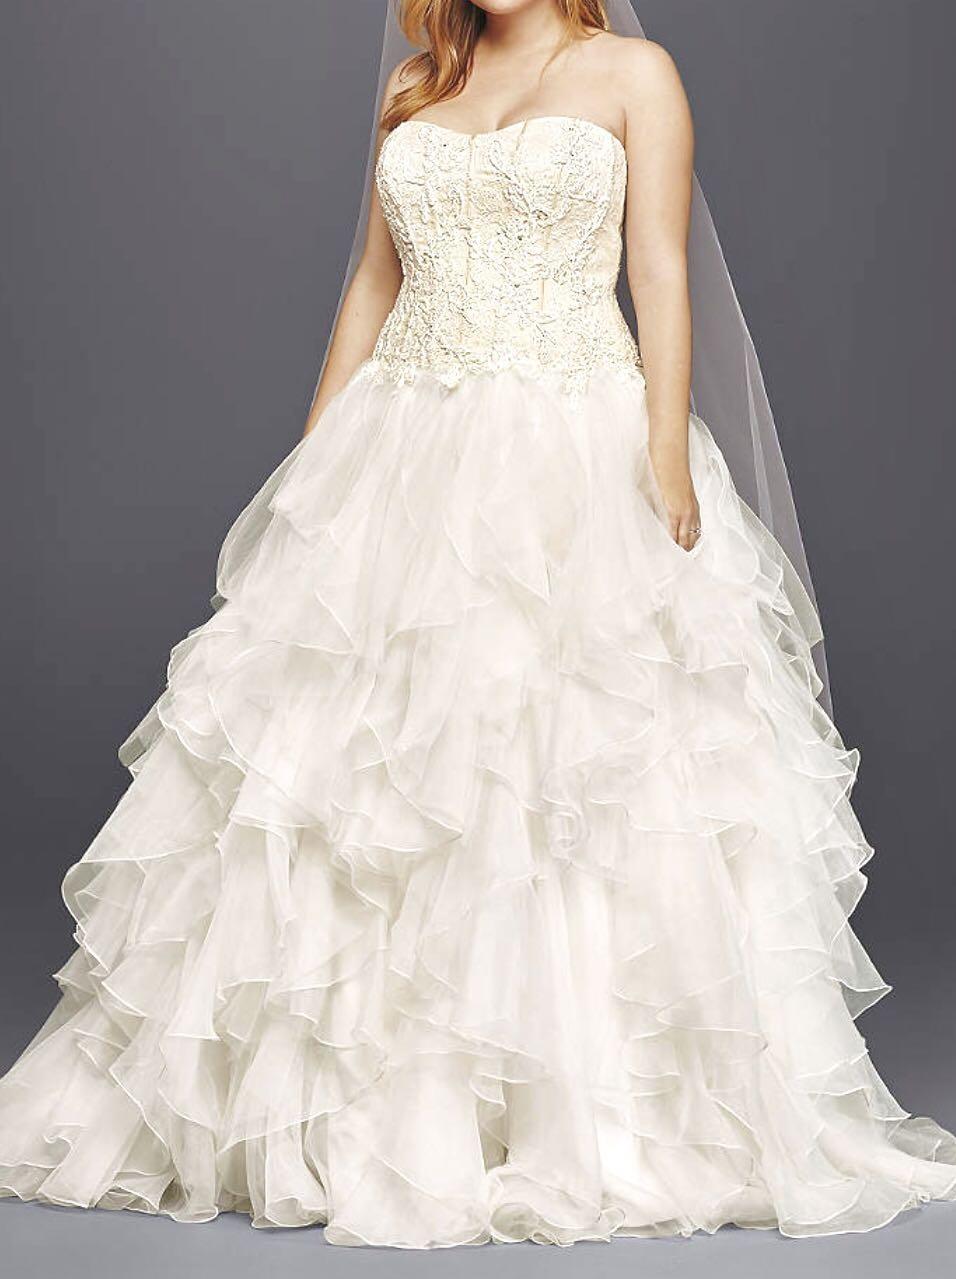 b05da980f86c8 Vera Wang Wedding Dresses Uk Sale - raveitsafe